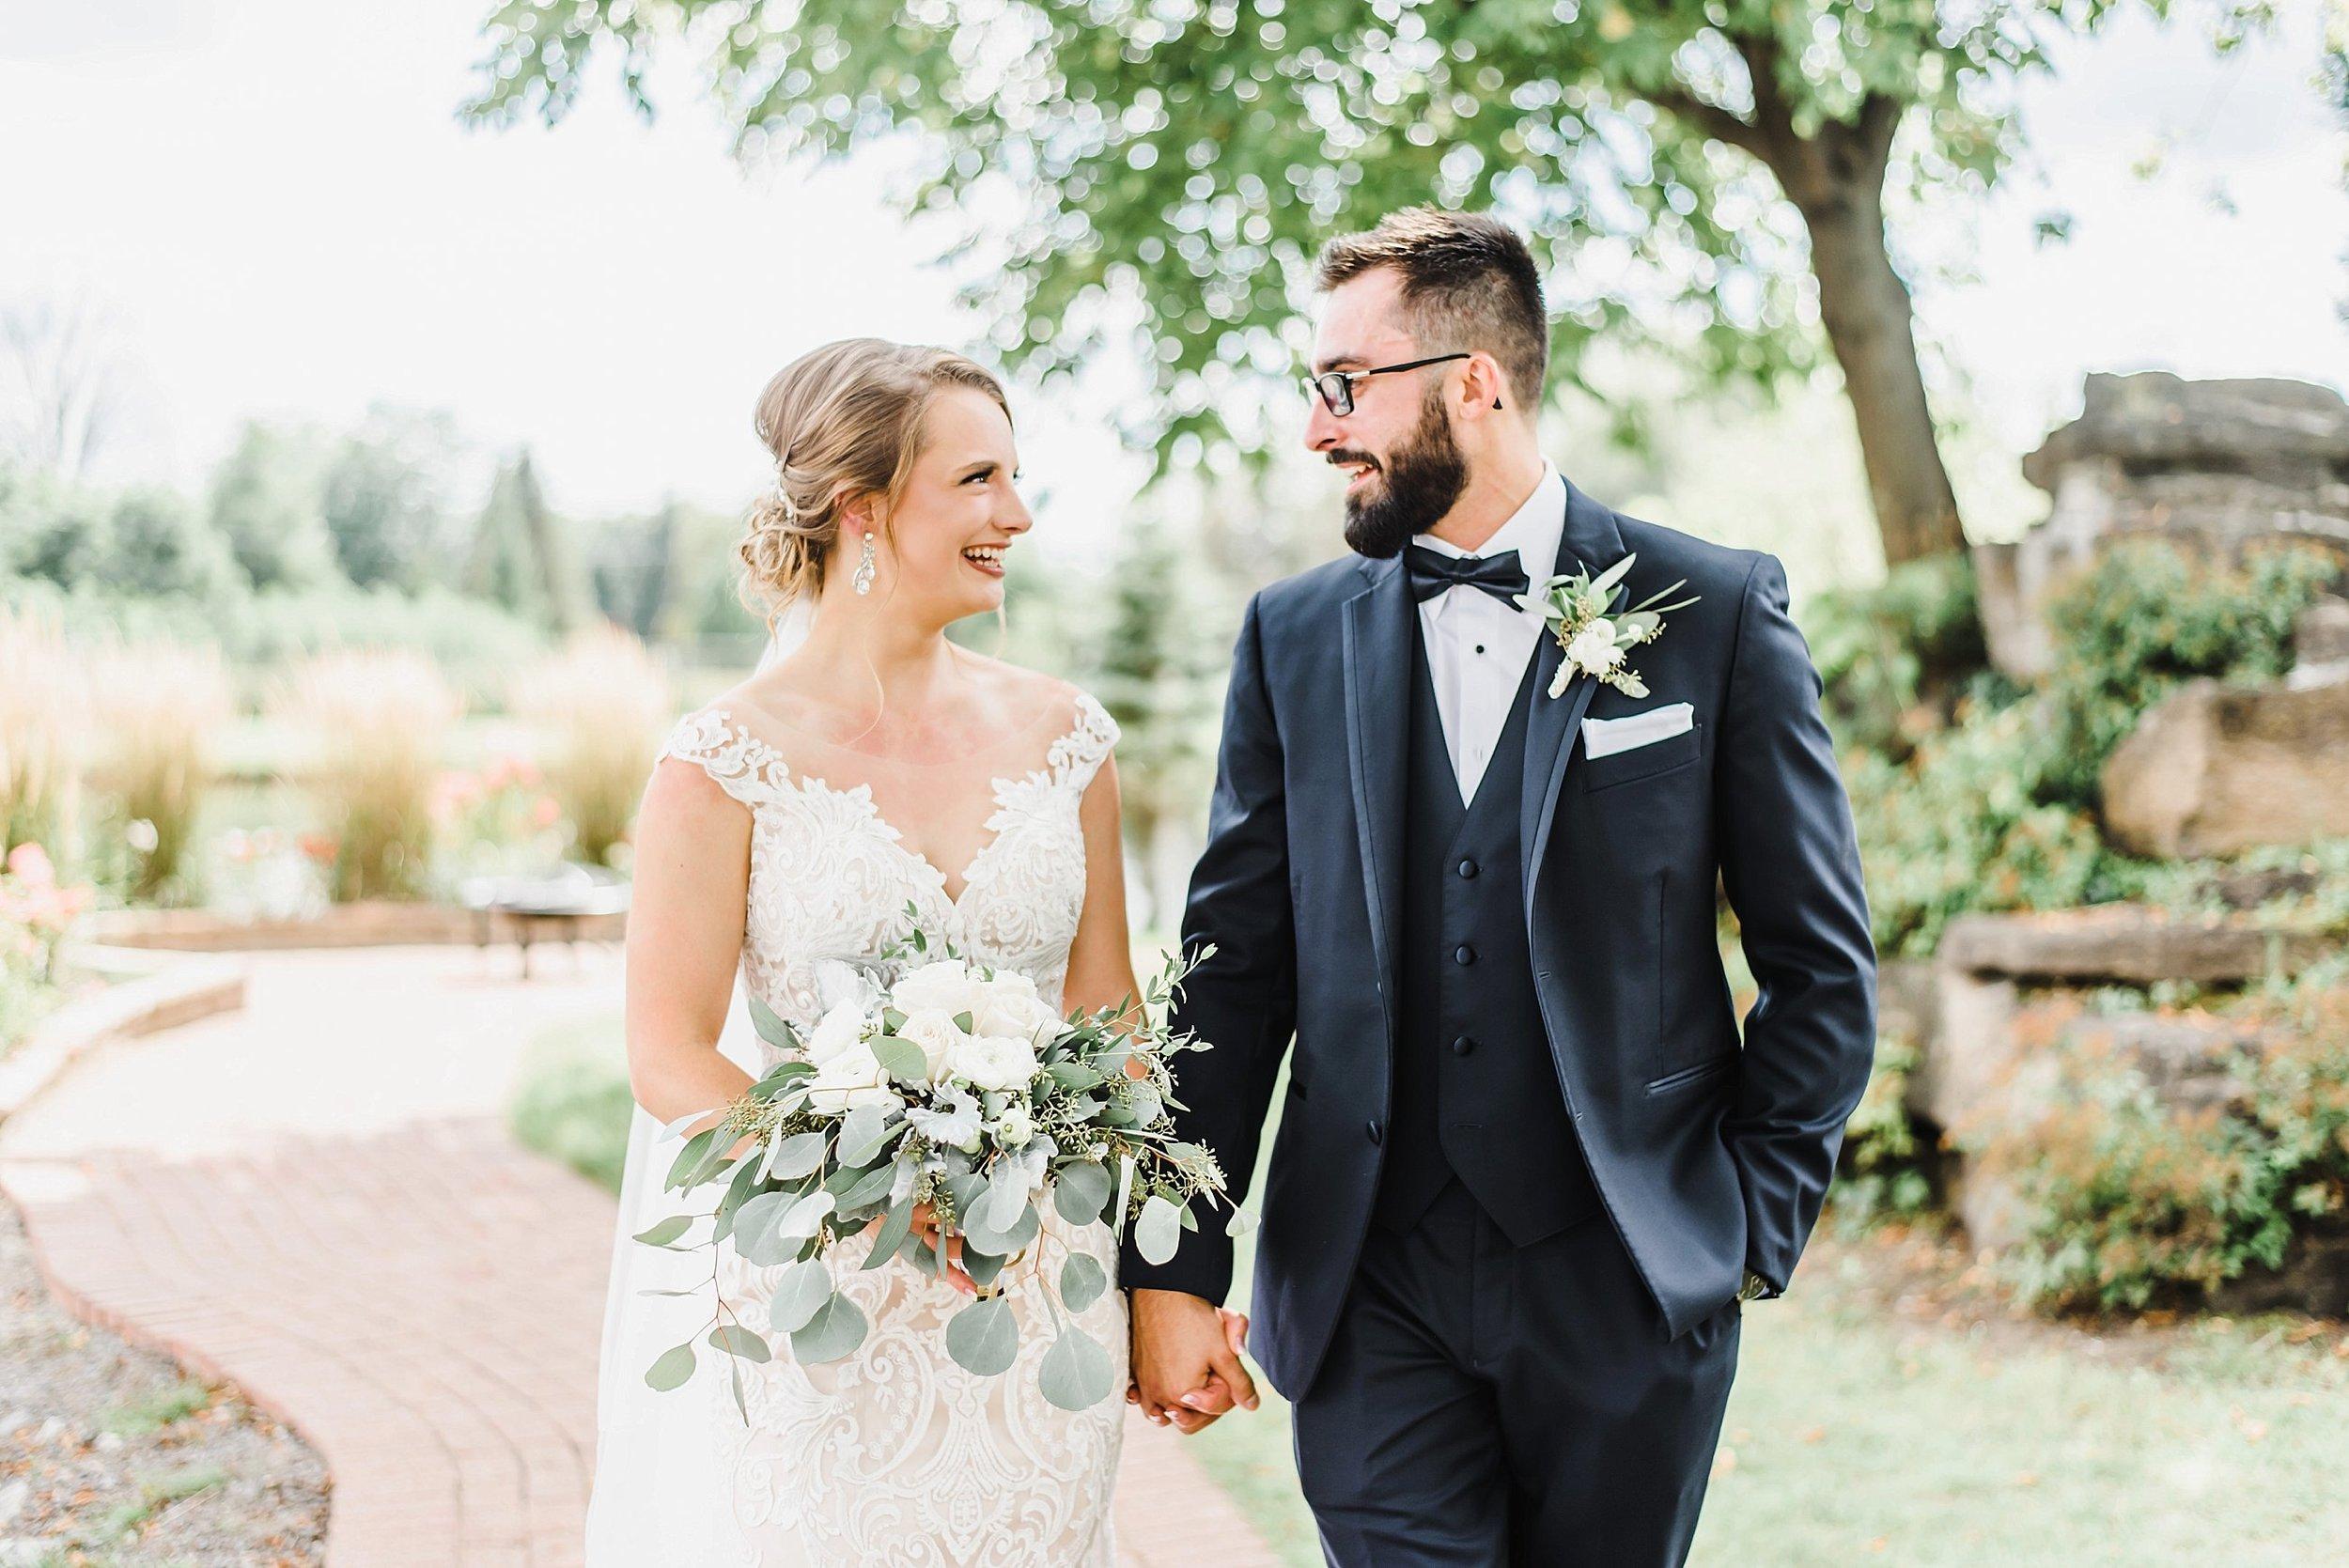 light airy indie fine art ottawa wedding photographer | Ali and Batoul Photography_1252.jpg